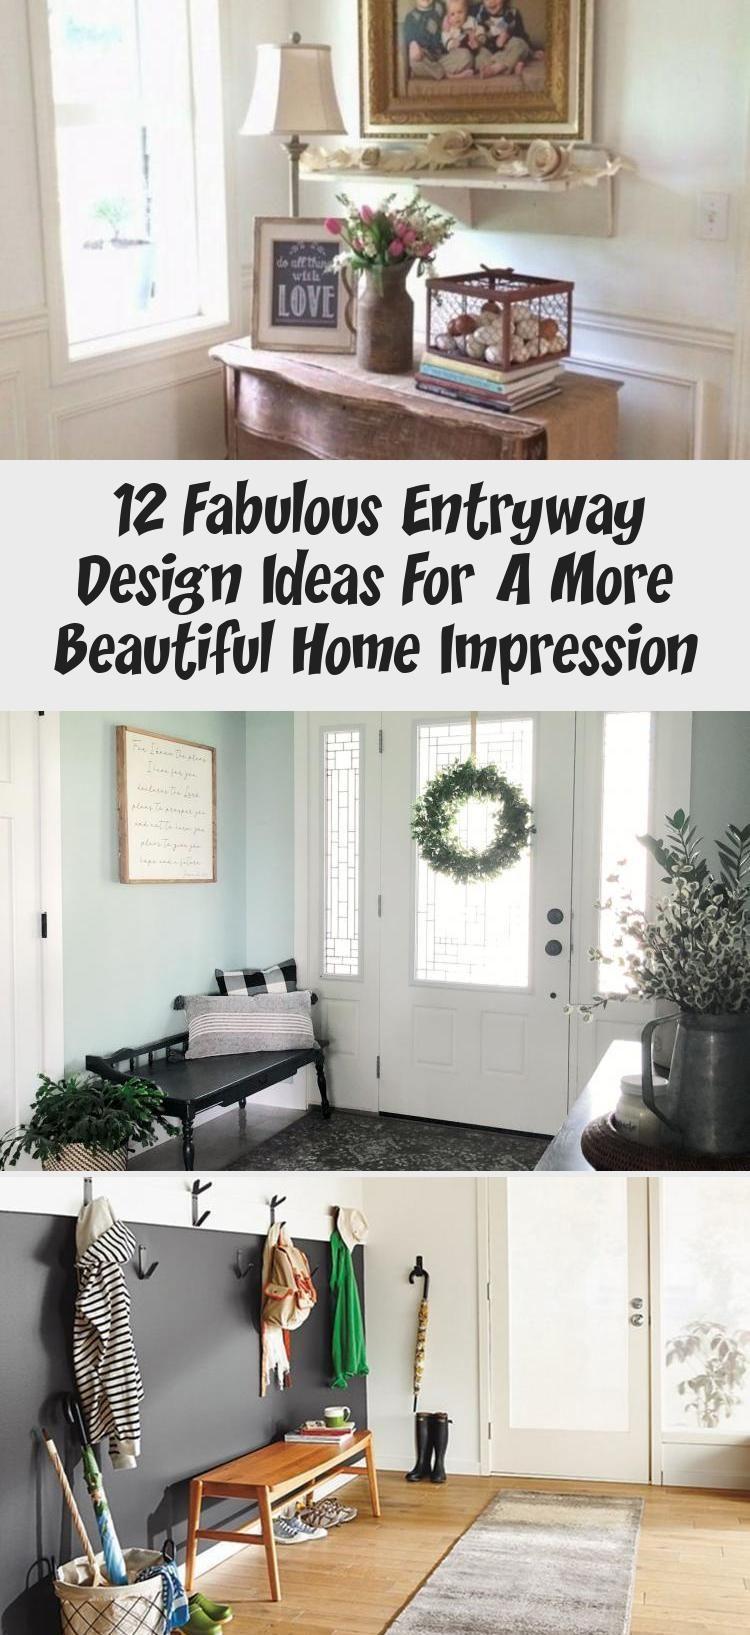 12 Fabulous Entryway Design Ideas For A More Beautiful Home Impression Decor Entry Way Design Home Decor Decor